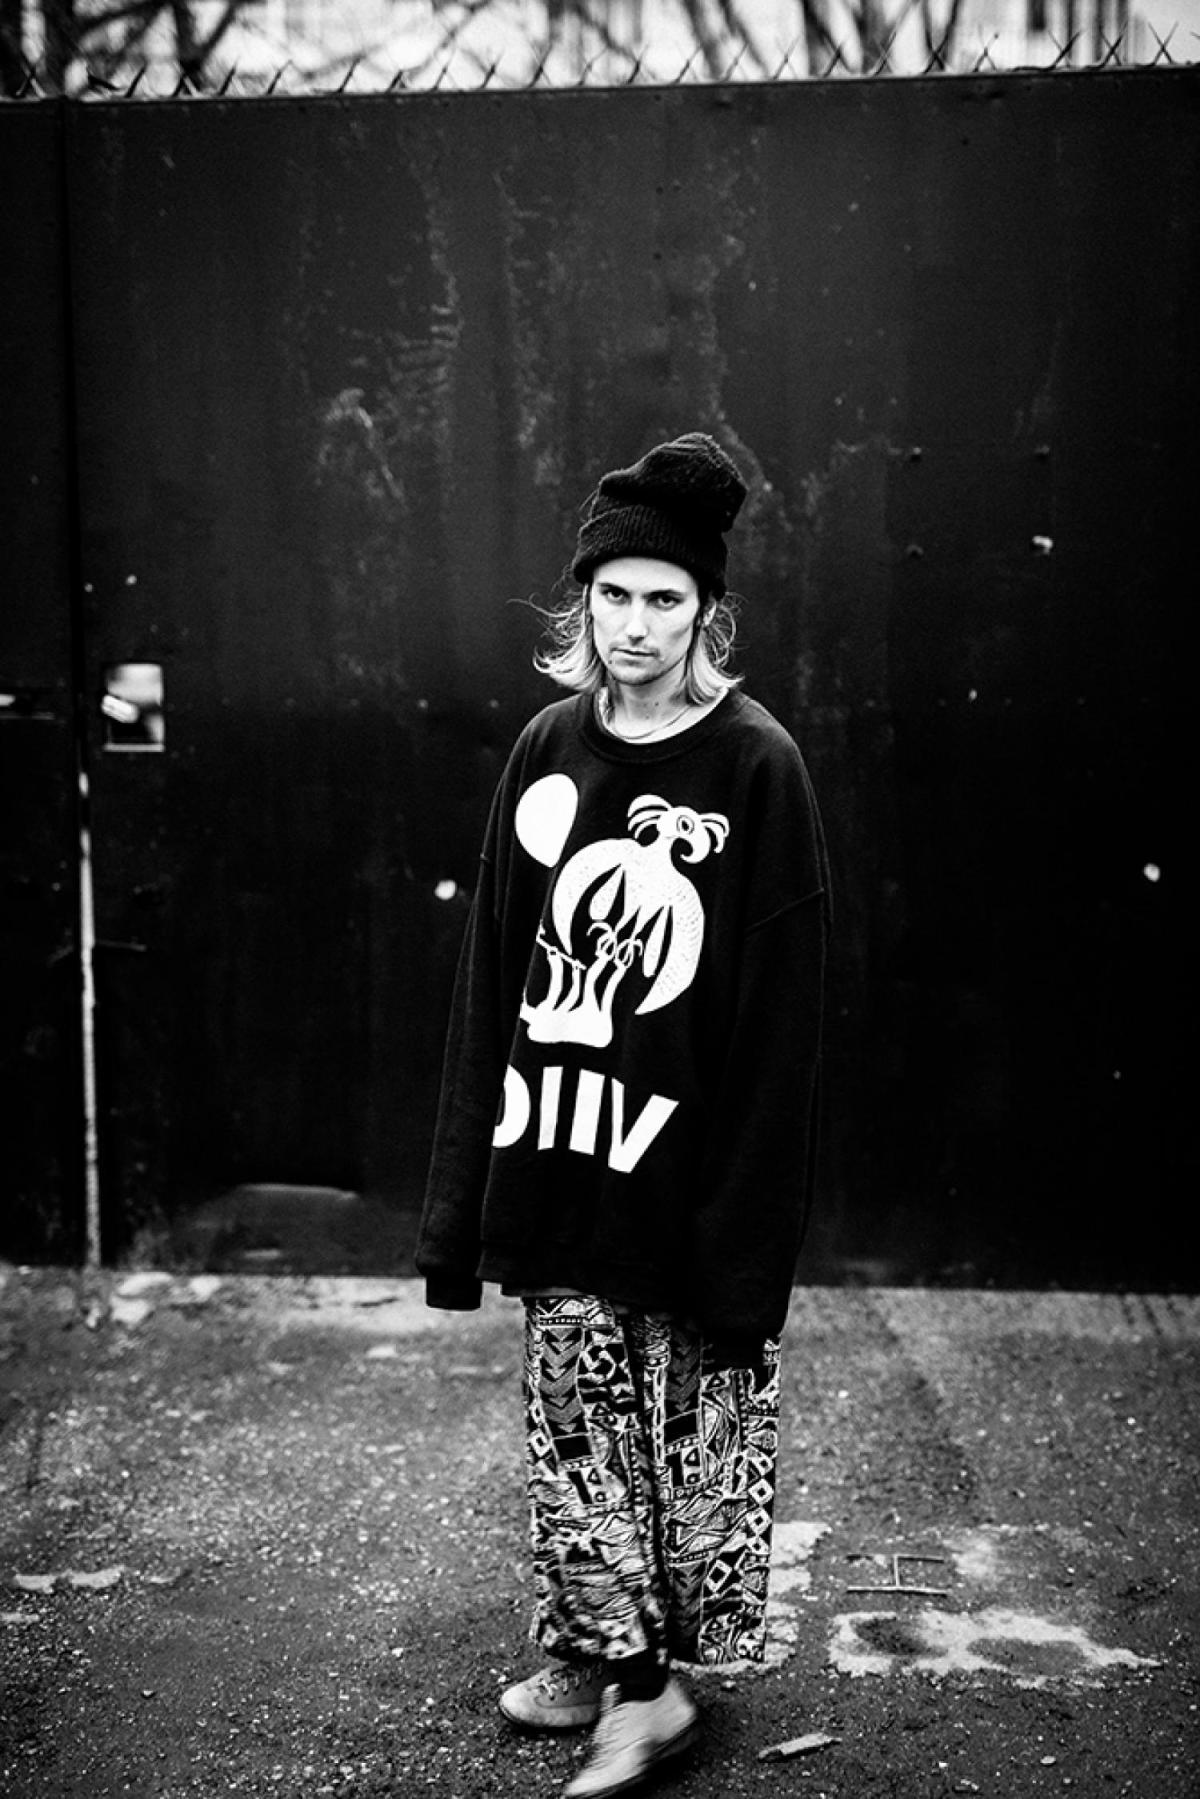 DIIV Sweatshirt